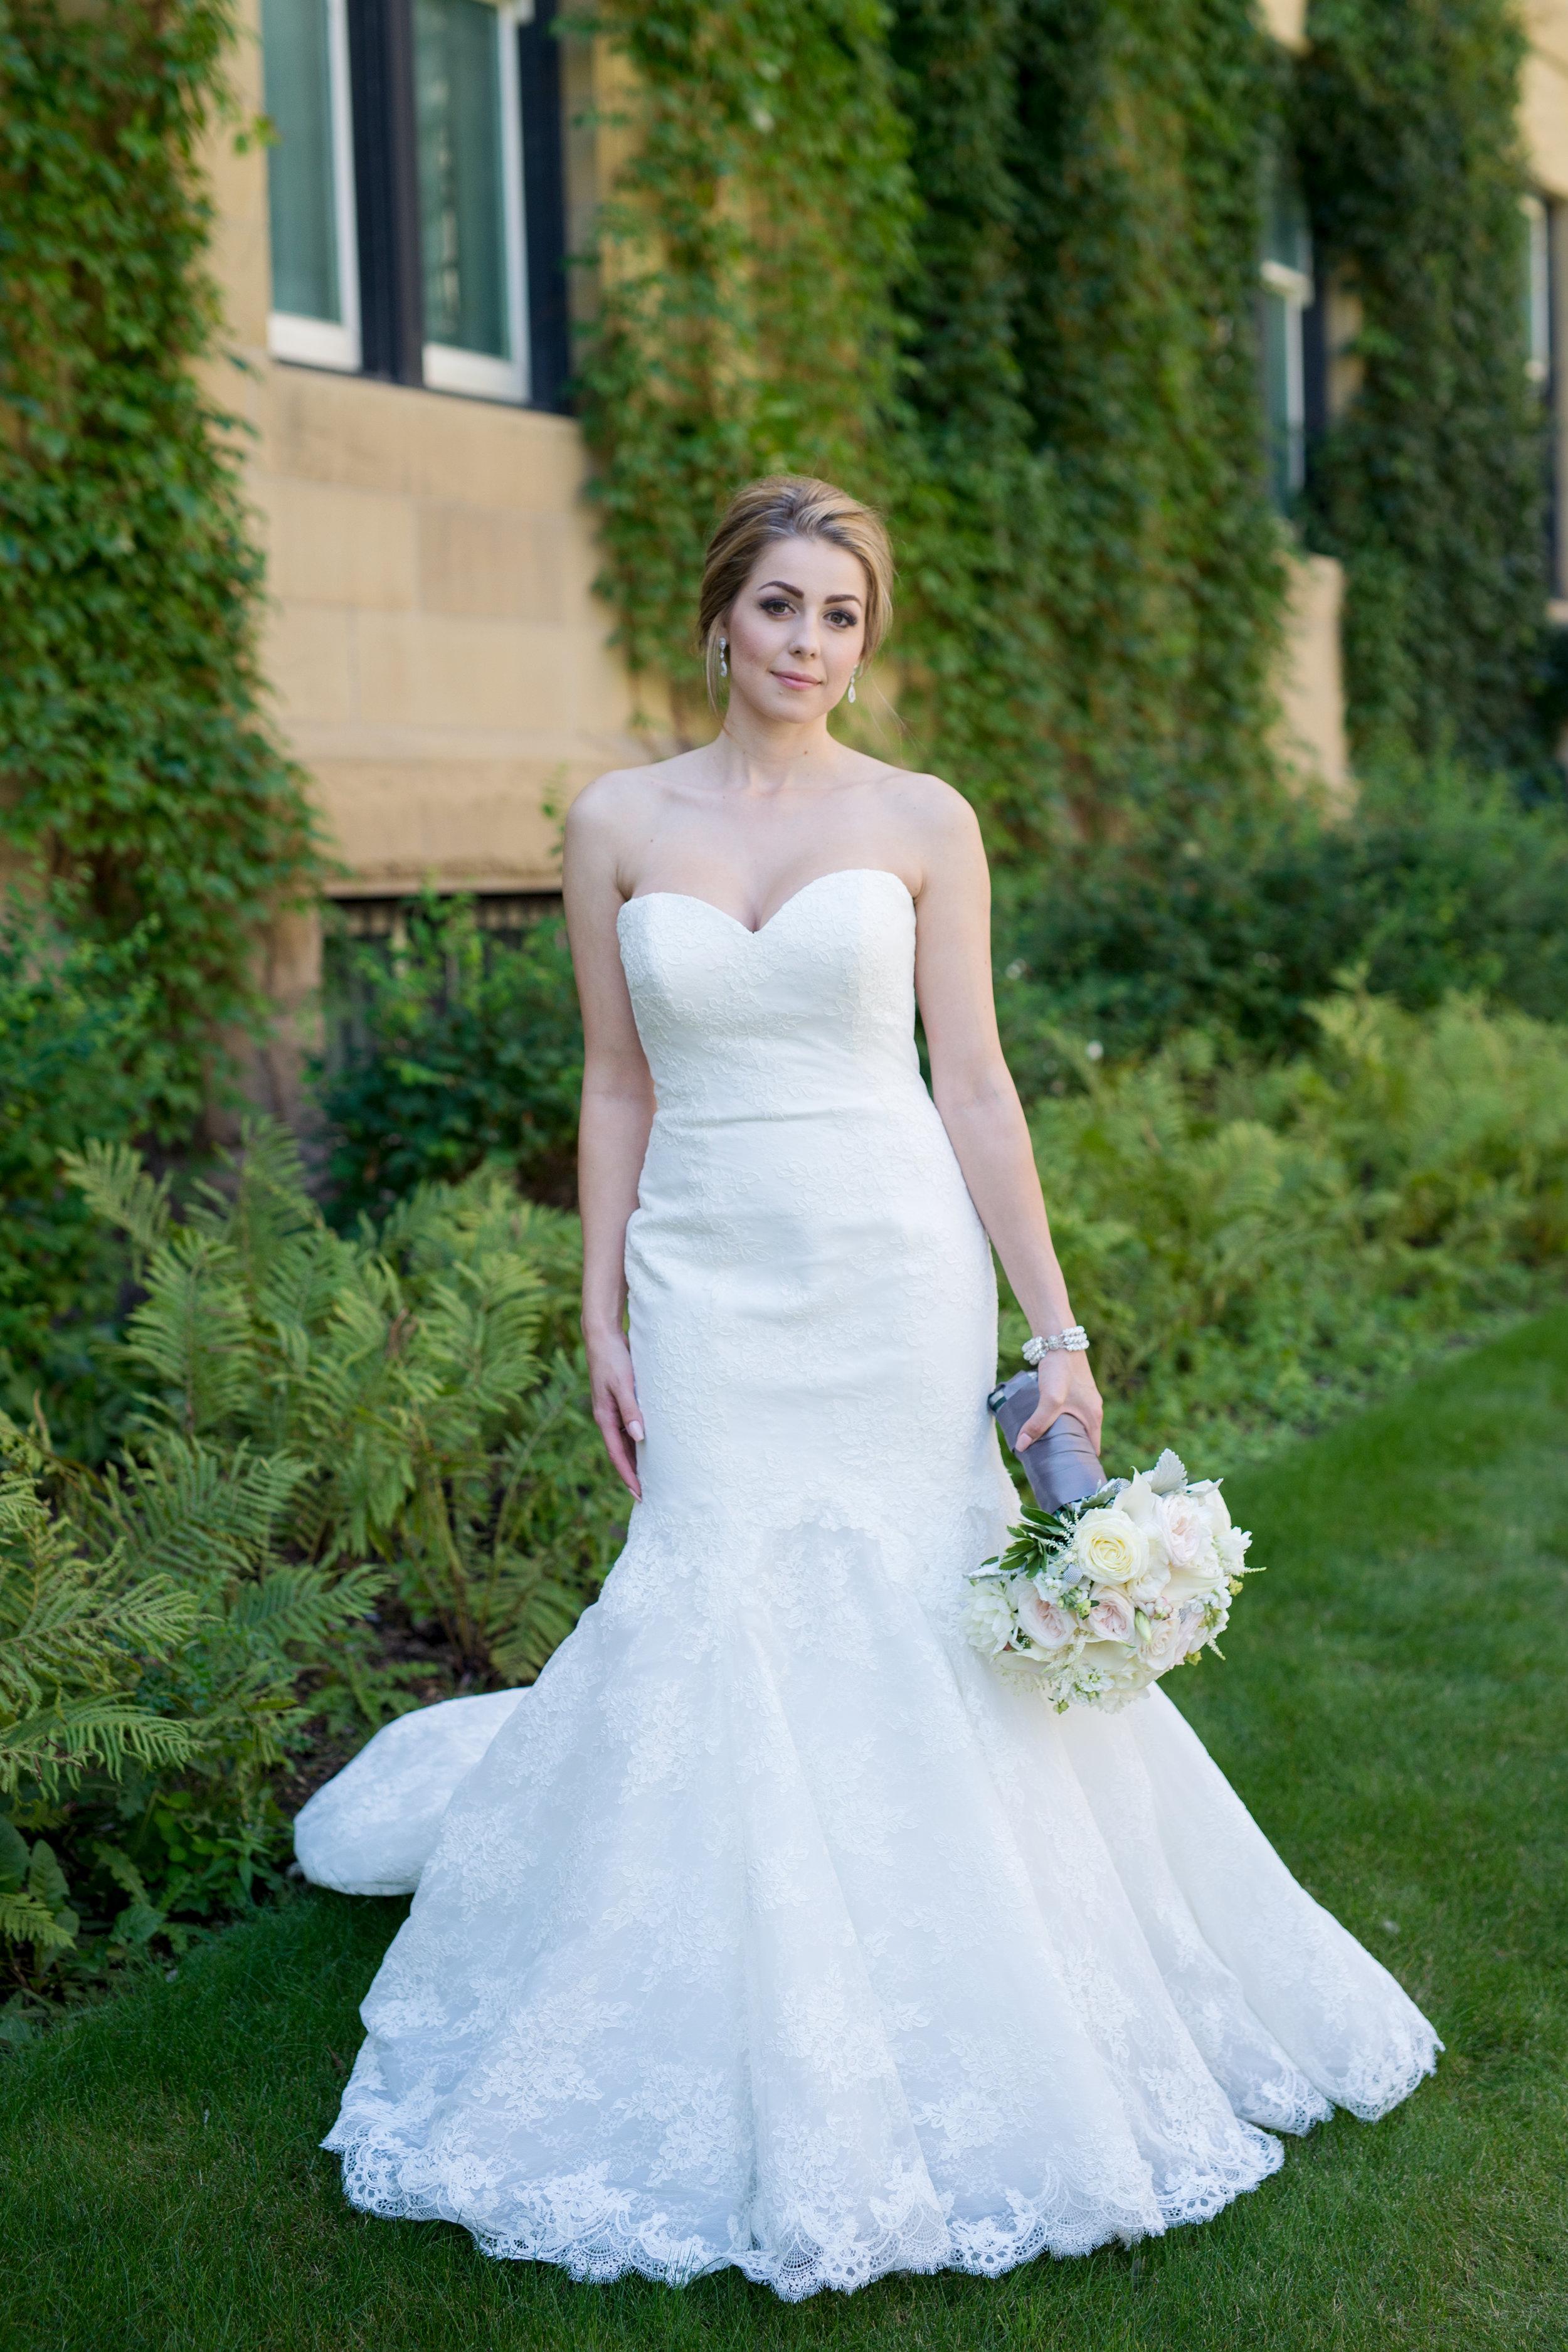 Calgary_Wedding_Photographer_Sanja_Scott_2016_HR 0311.jpg